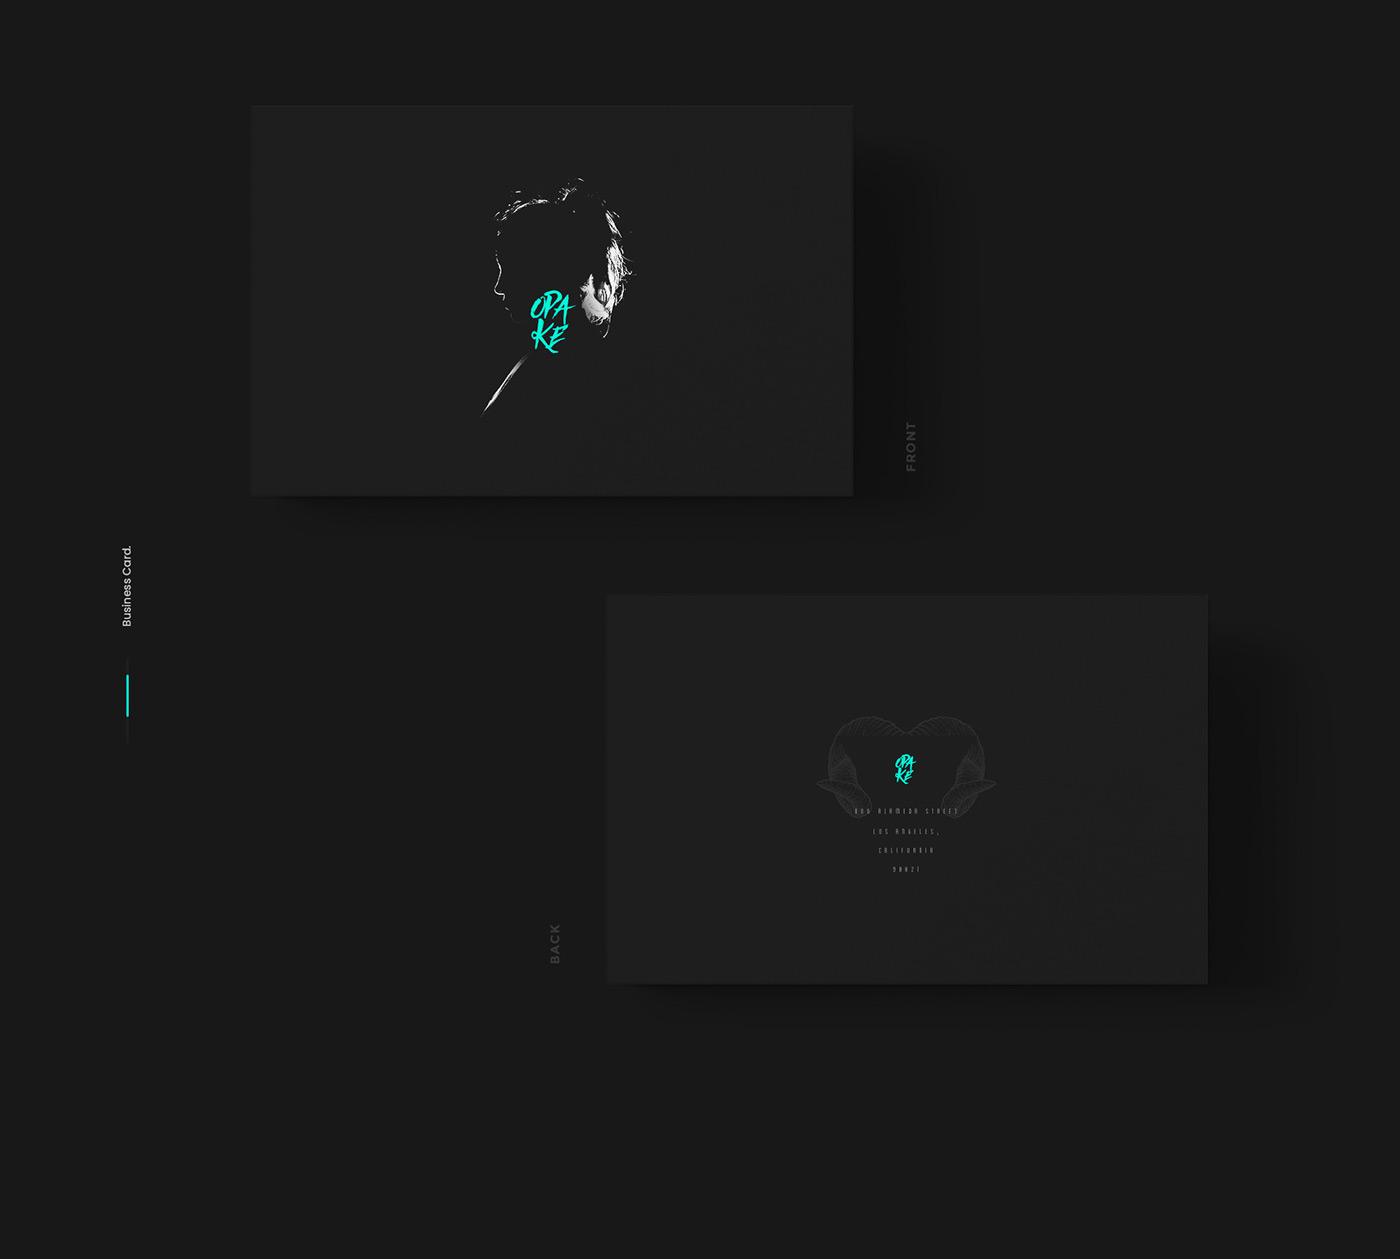 branding  logo print design  graphic desing opake art collective ILLUSTRATION  business card black